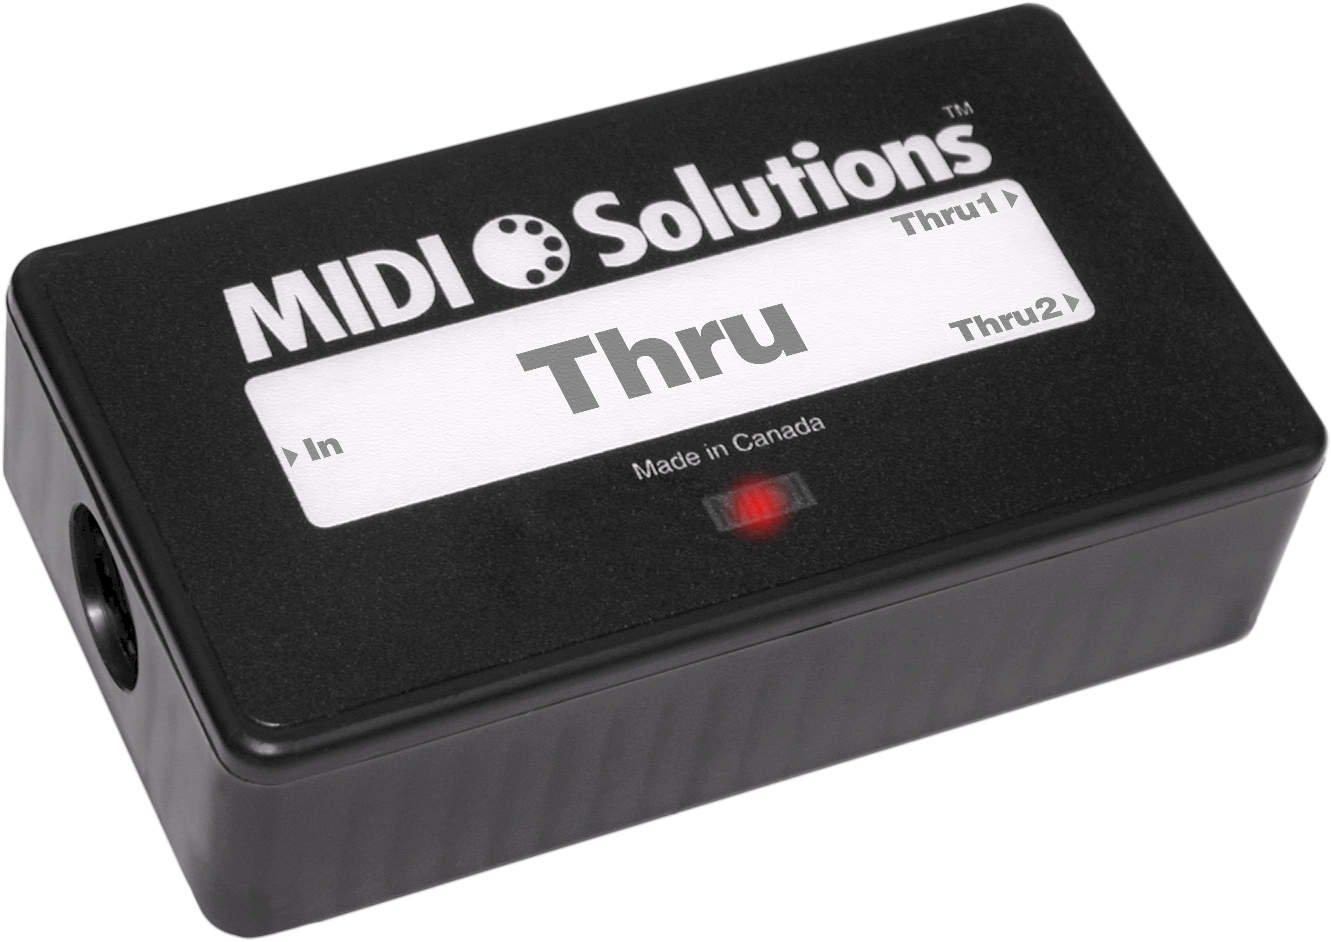 MIDI Solutions 2-Output Active MIDI Thru Box MIDISolutions MID-6032